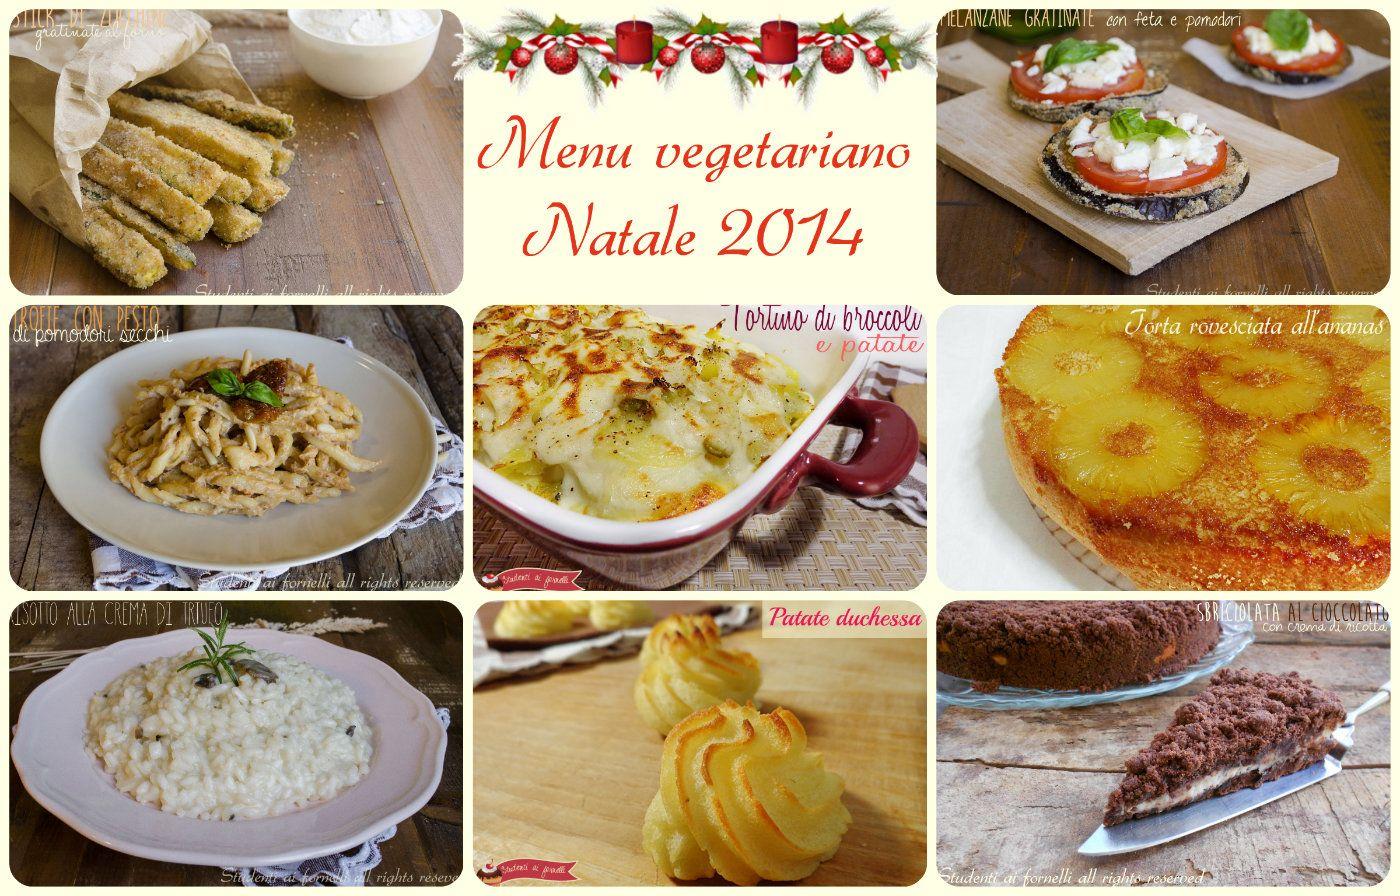 Menu vegetariano Natale 2014 ricette facili e gustose | Vegetarian ...